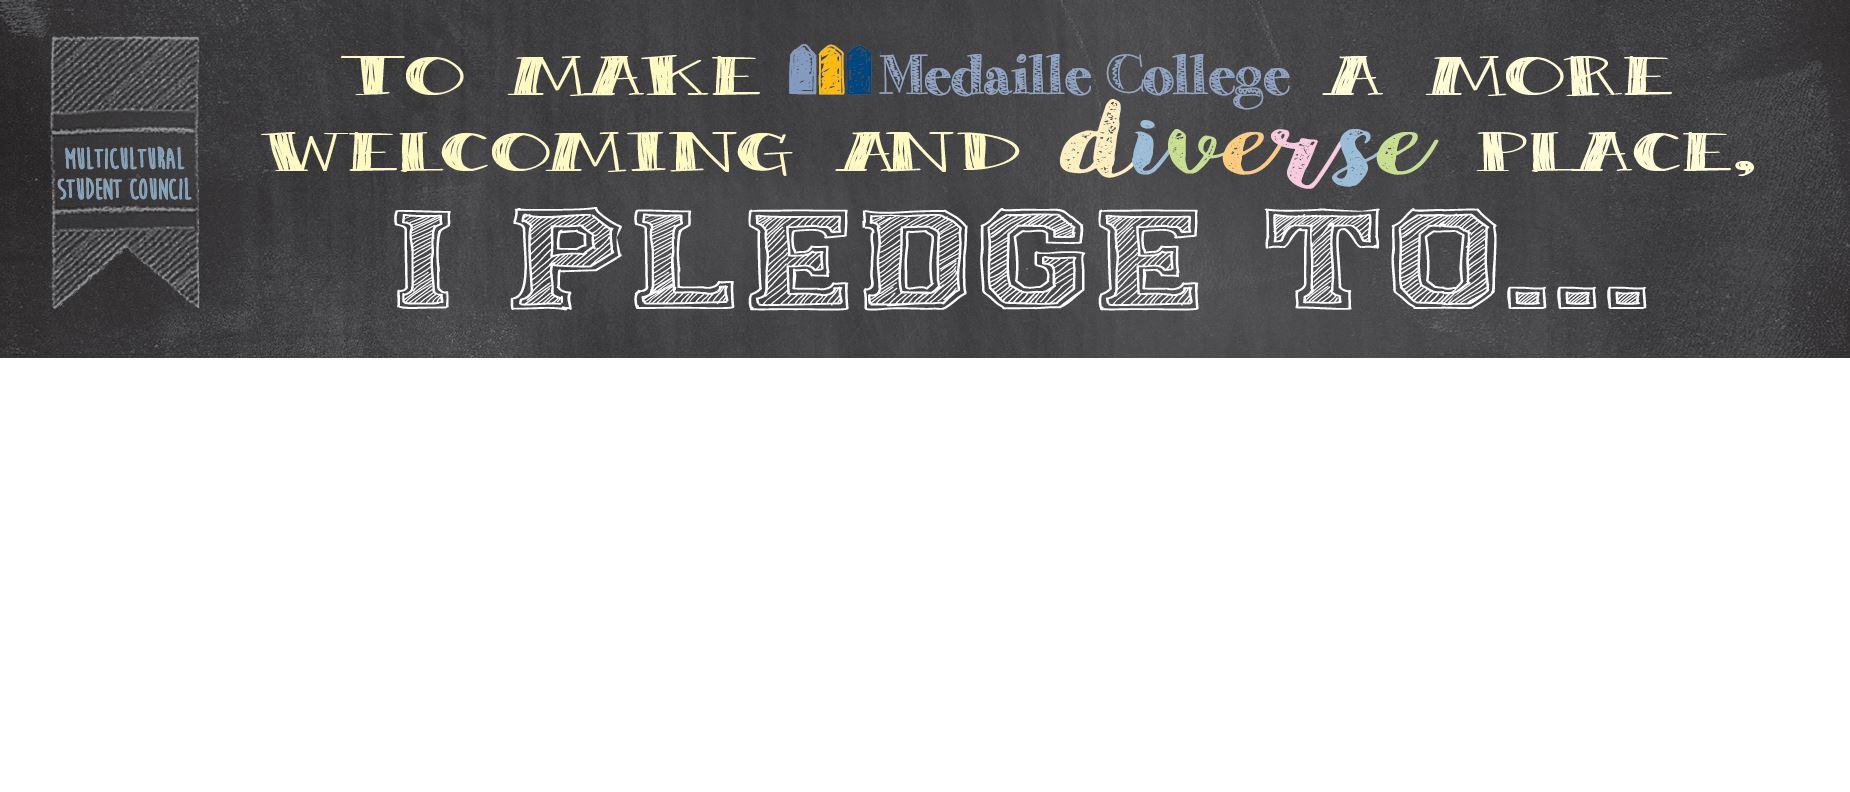 pledge card photo